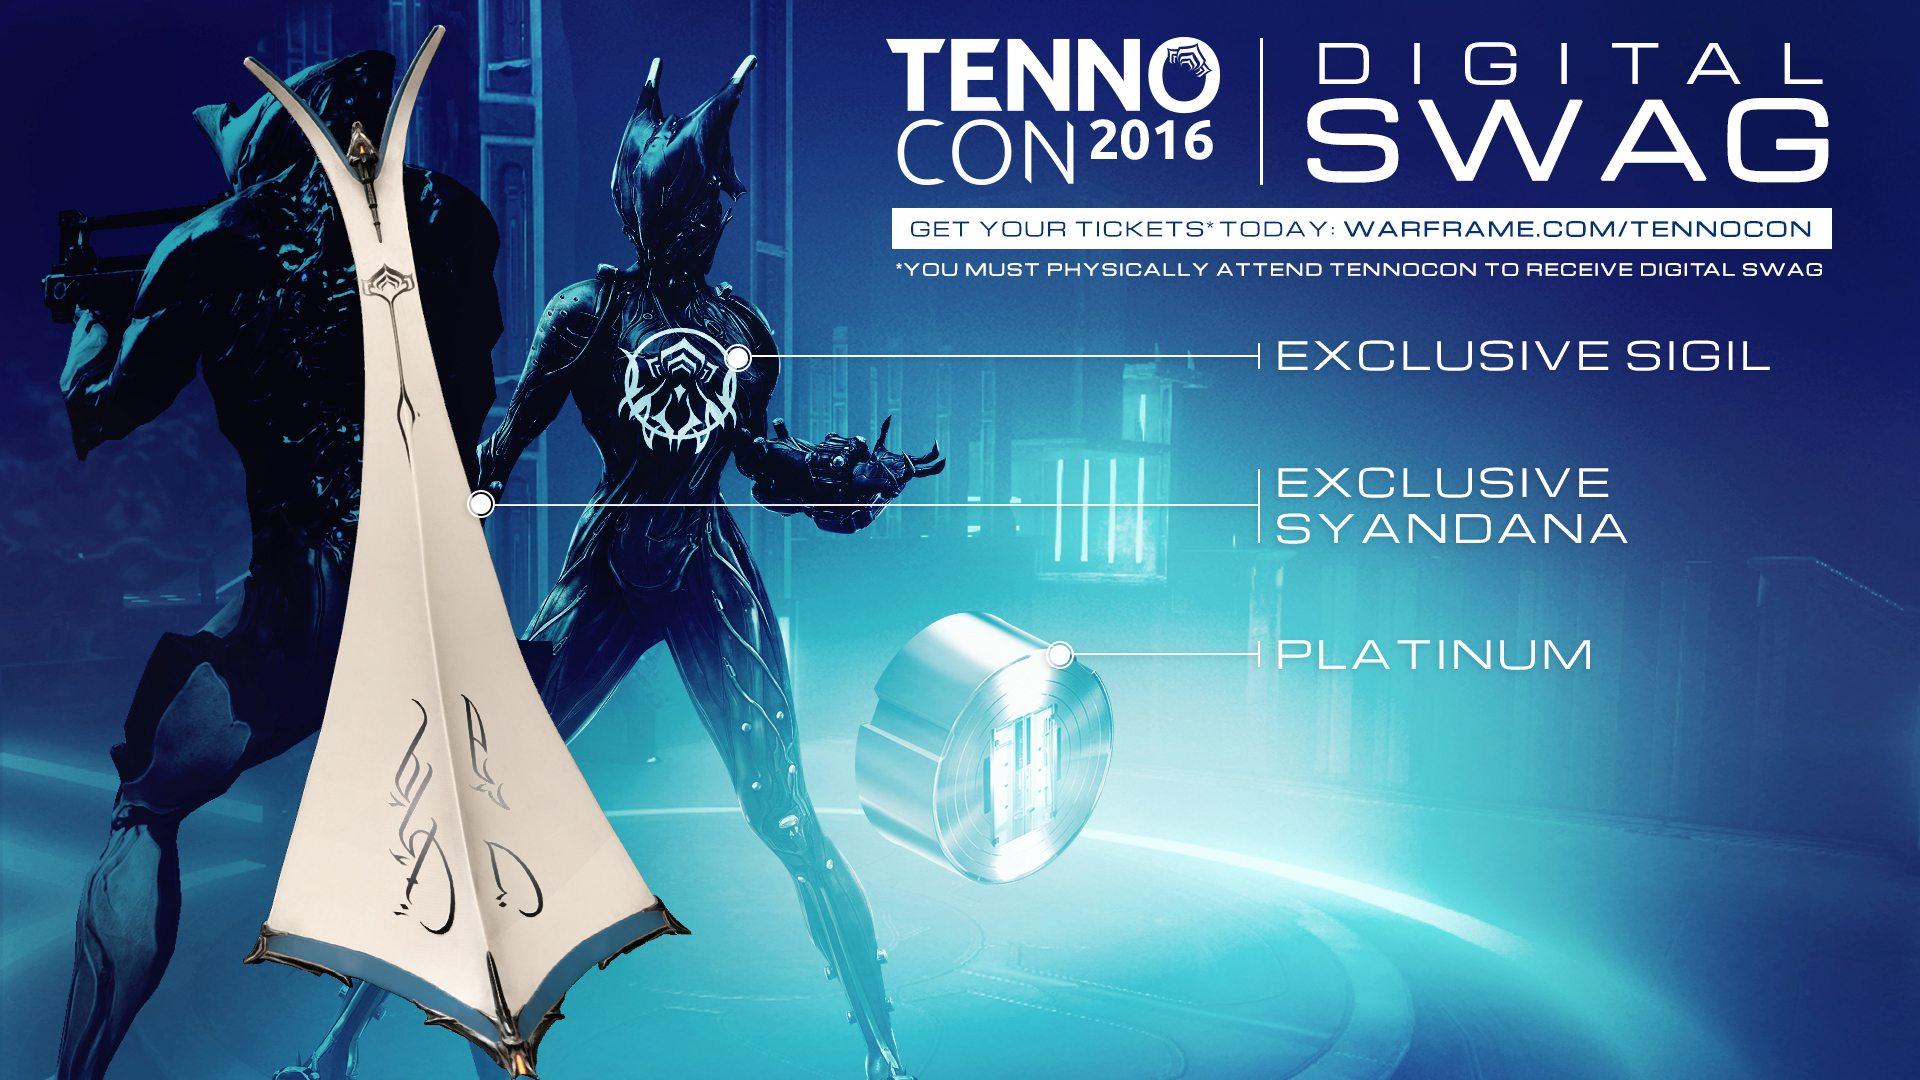 Warframe and Outward Bound Canada Partner on TennoCon 2016